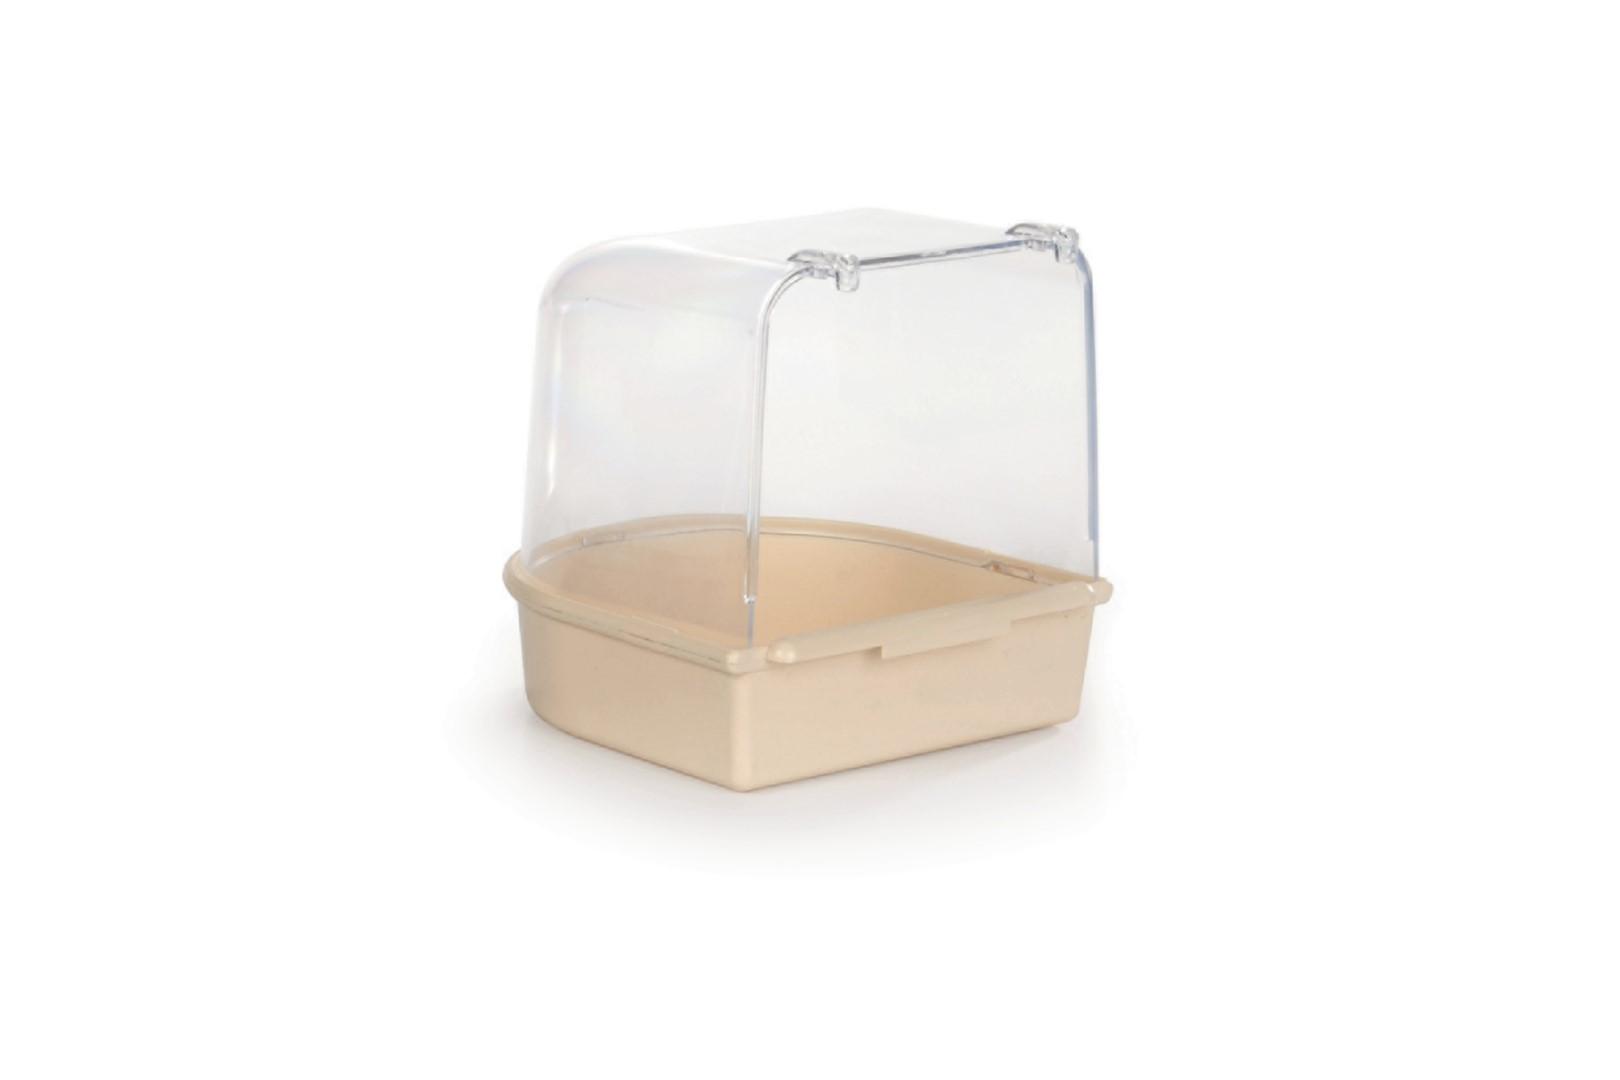 Plastic badhuisje beige 13x13x13